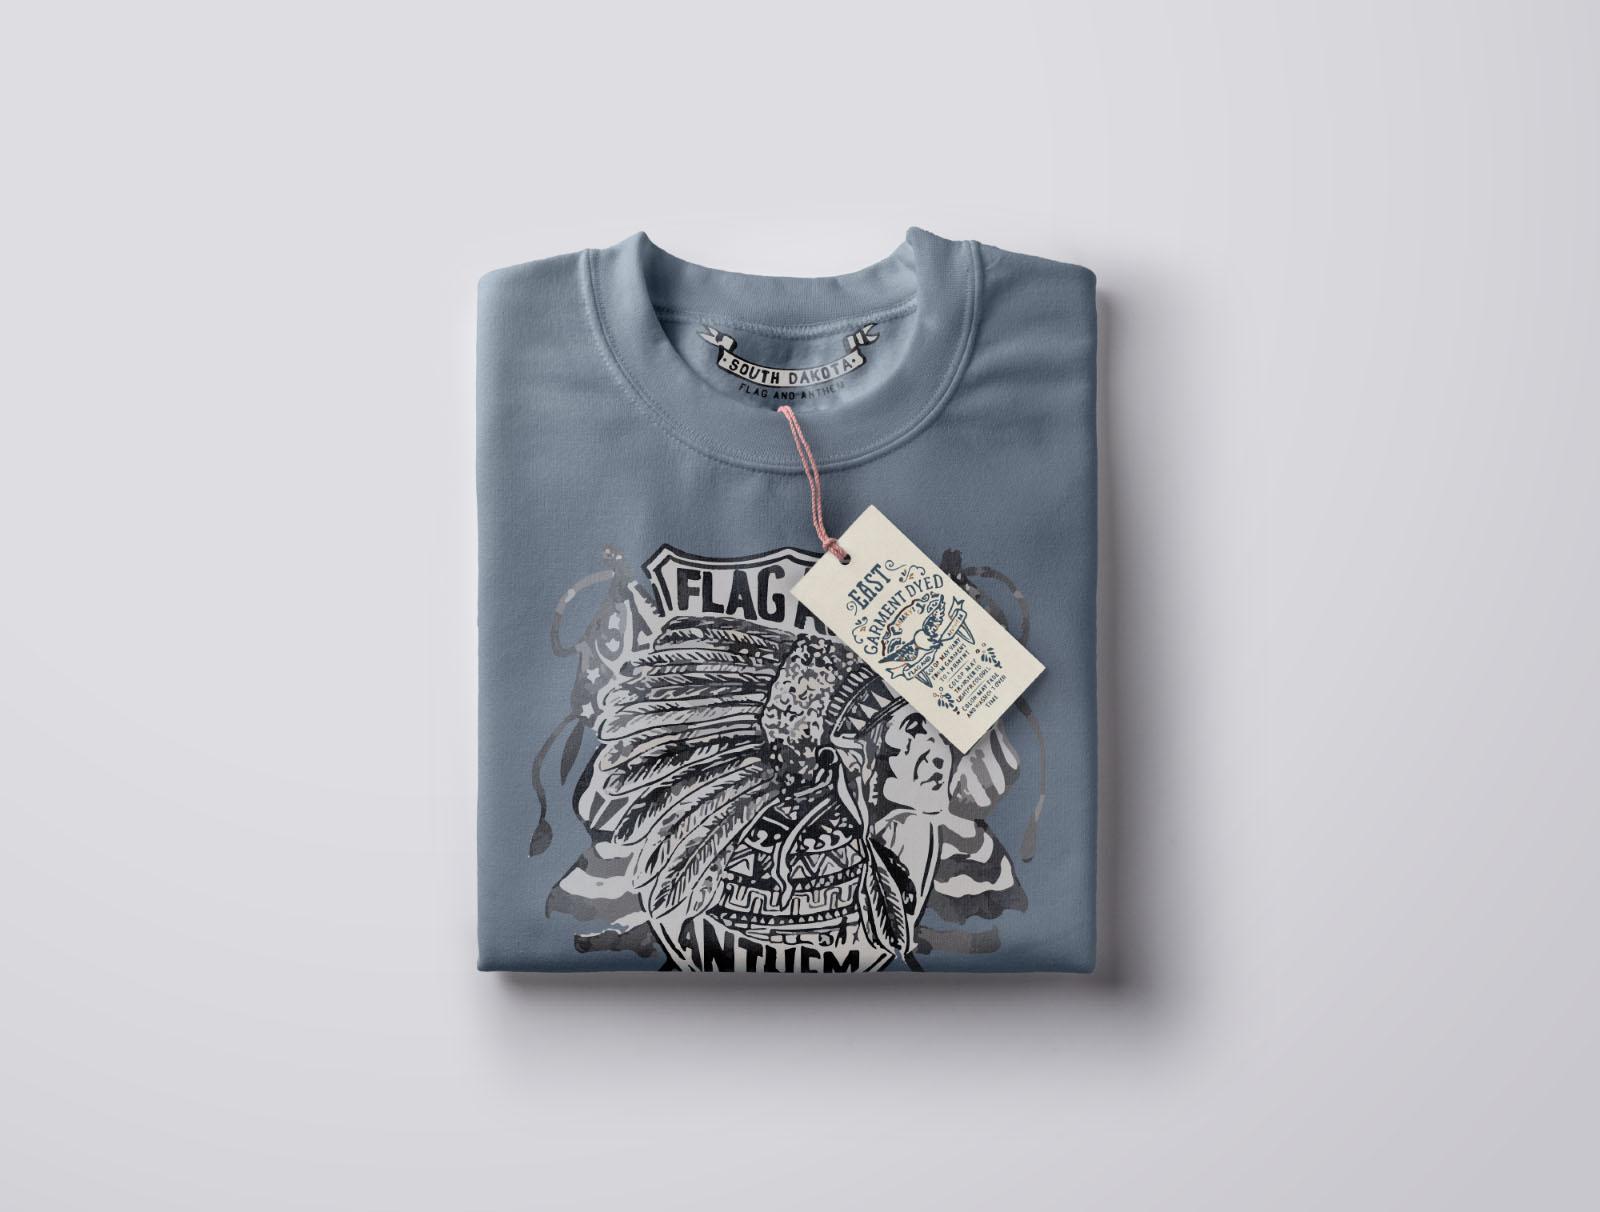 Folded Top View Sweatshirt Mockup